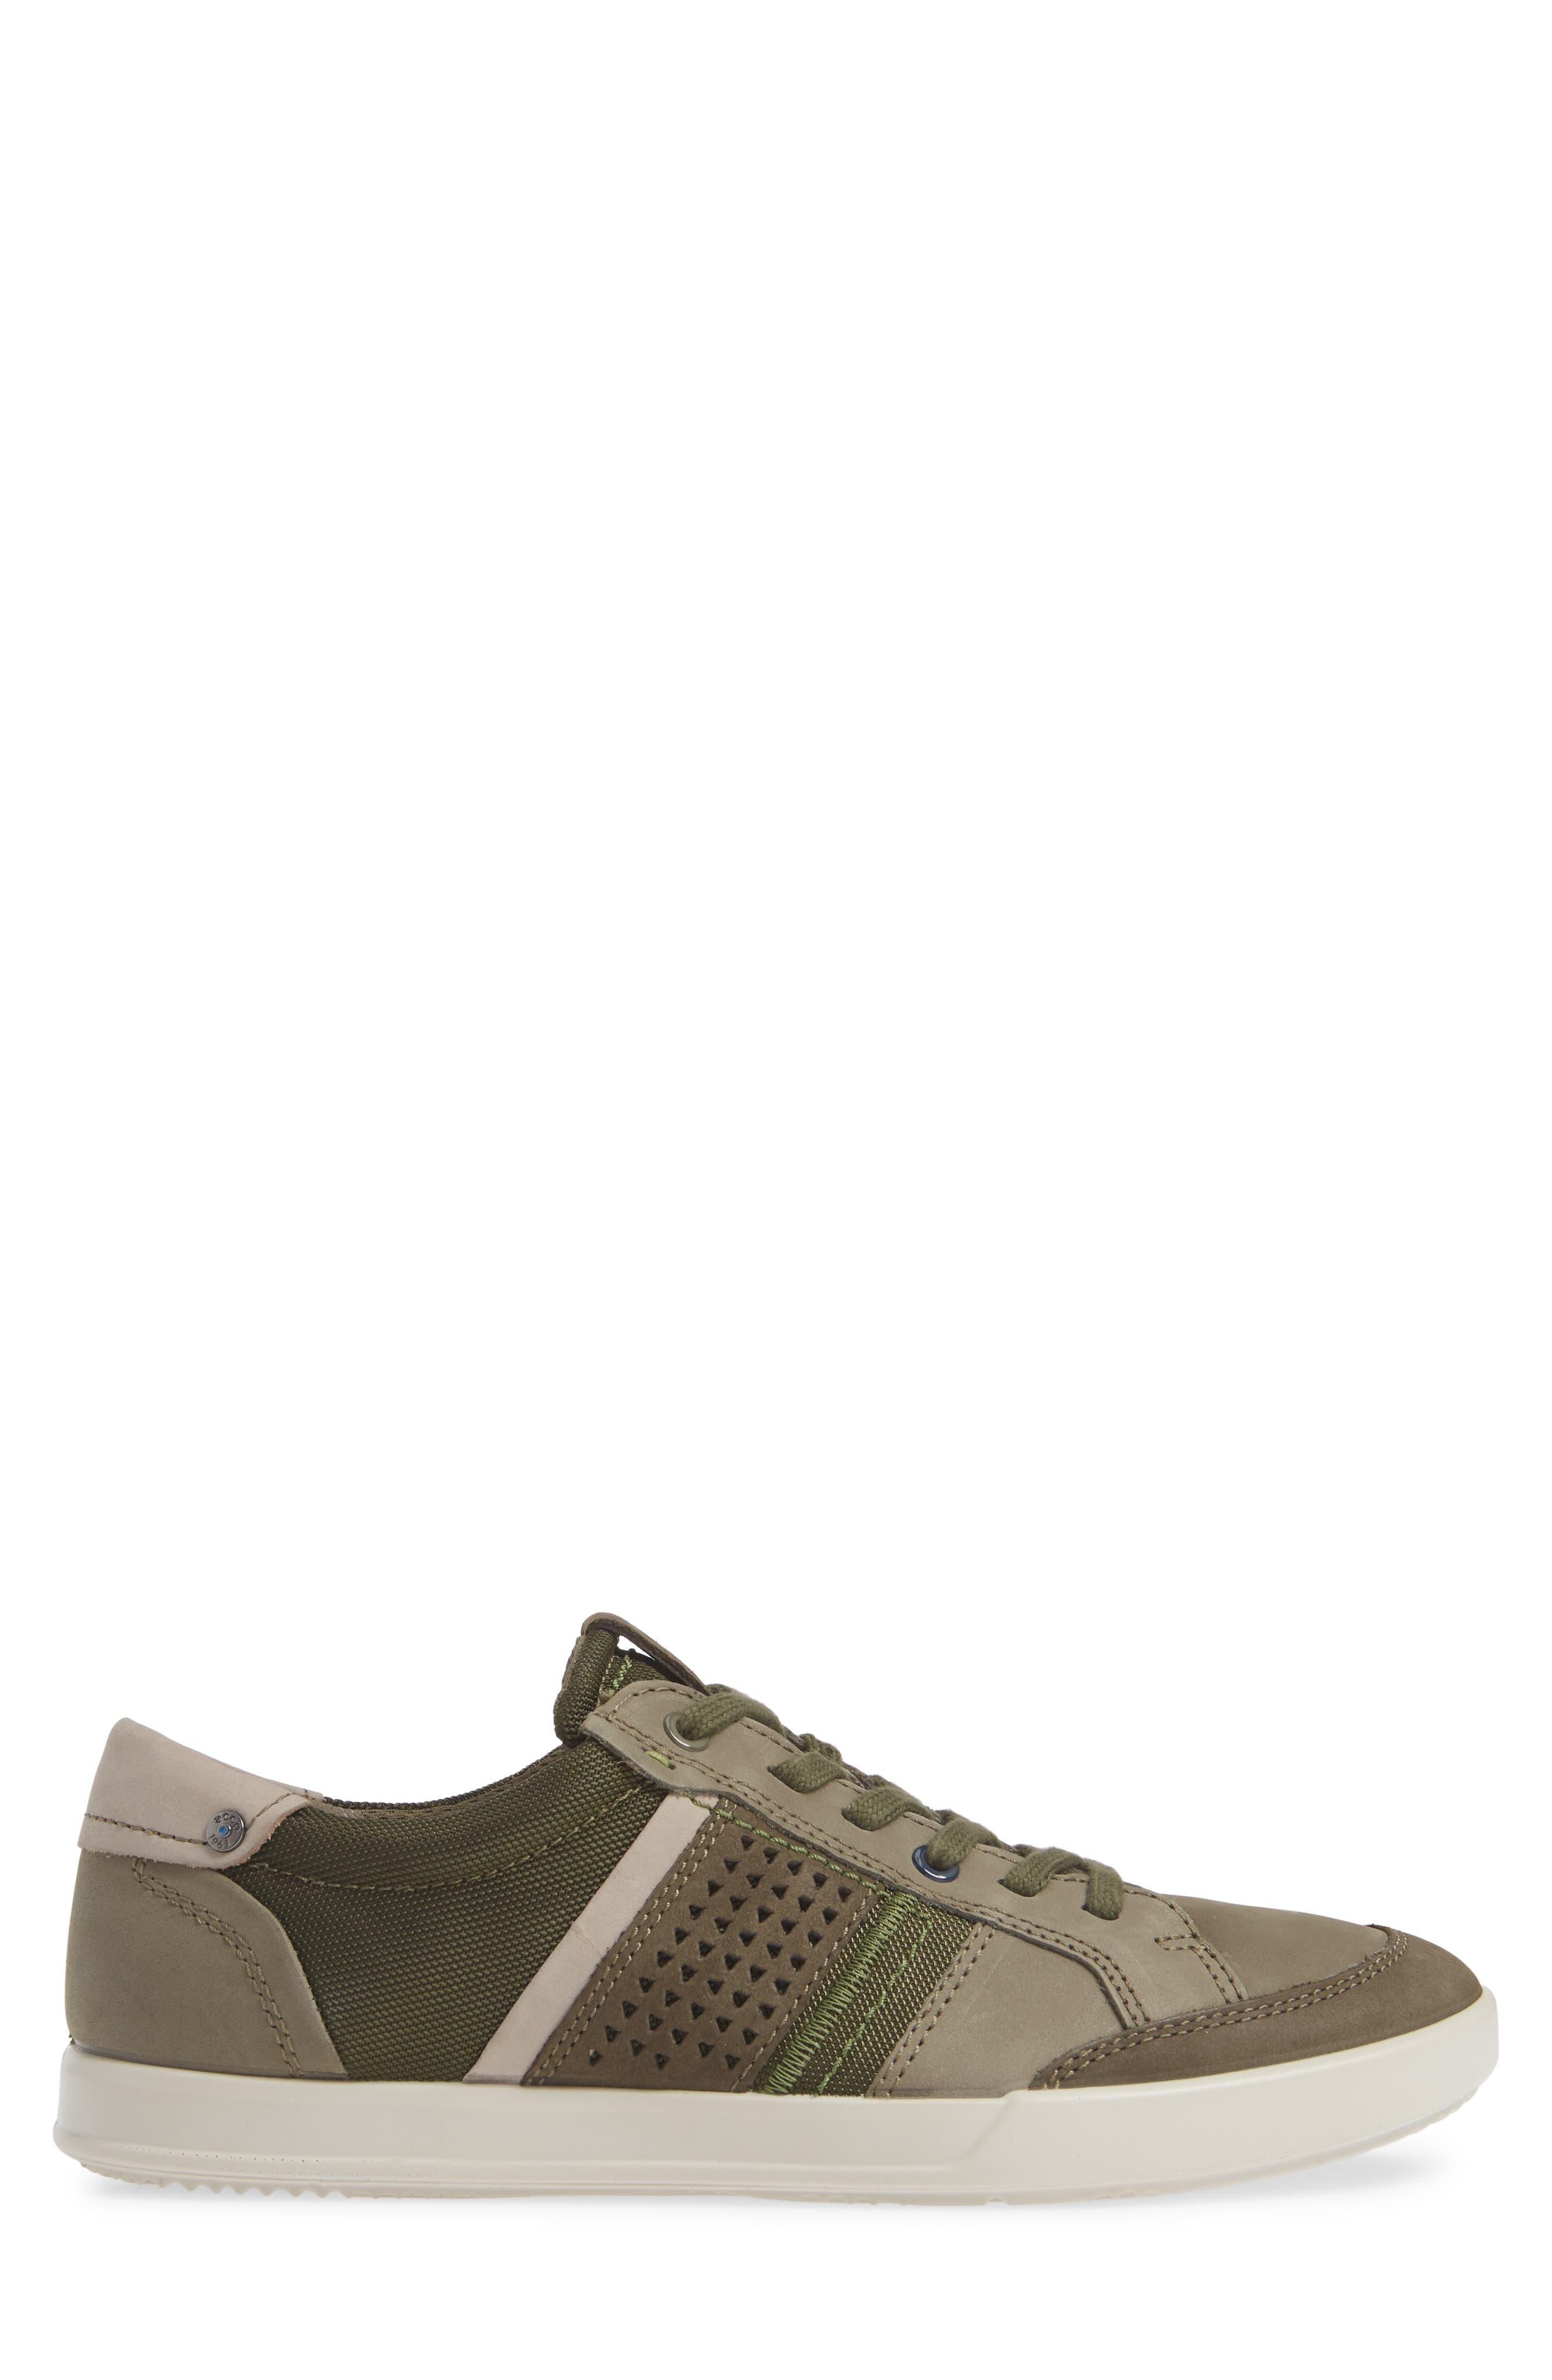 ECCO, Collin 2.0 Sneaker, Alternate thumbnail 3, color, TARMAC LEATHER